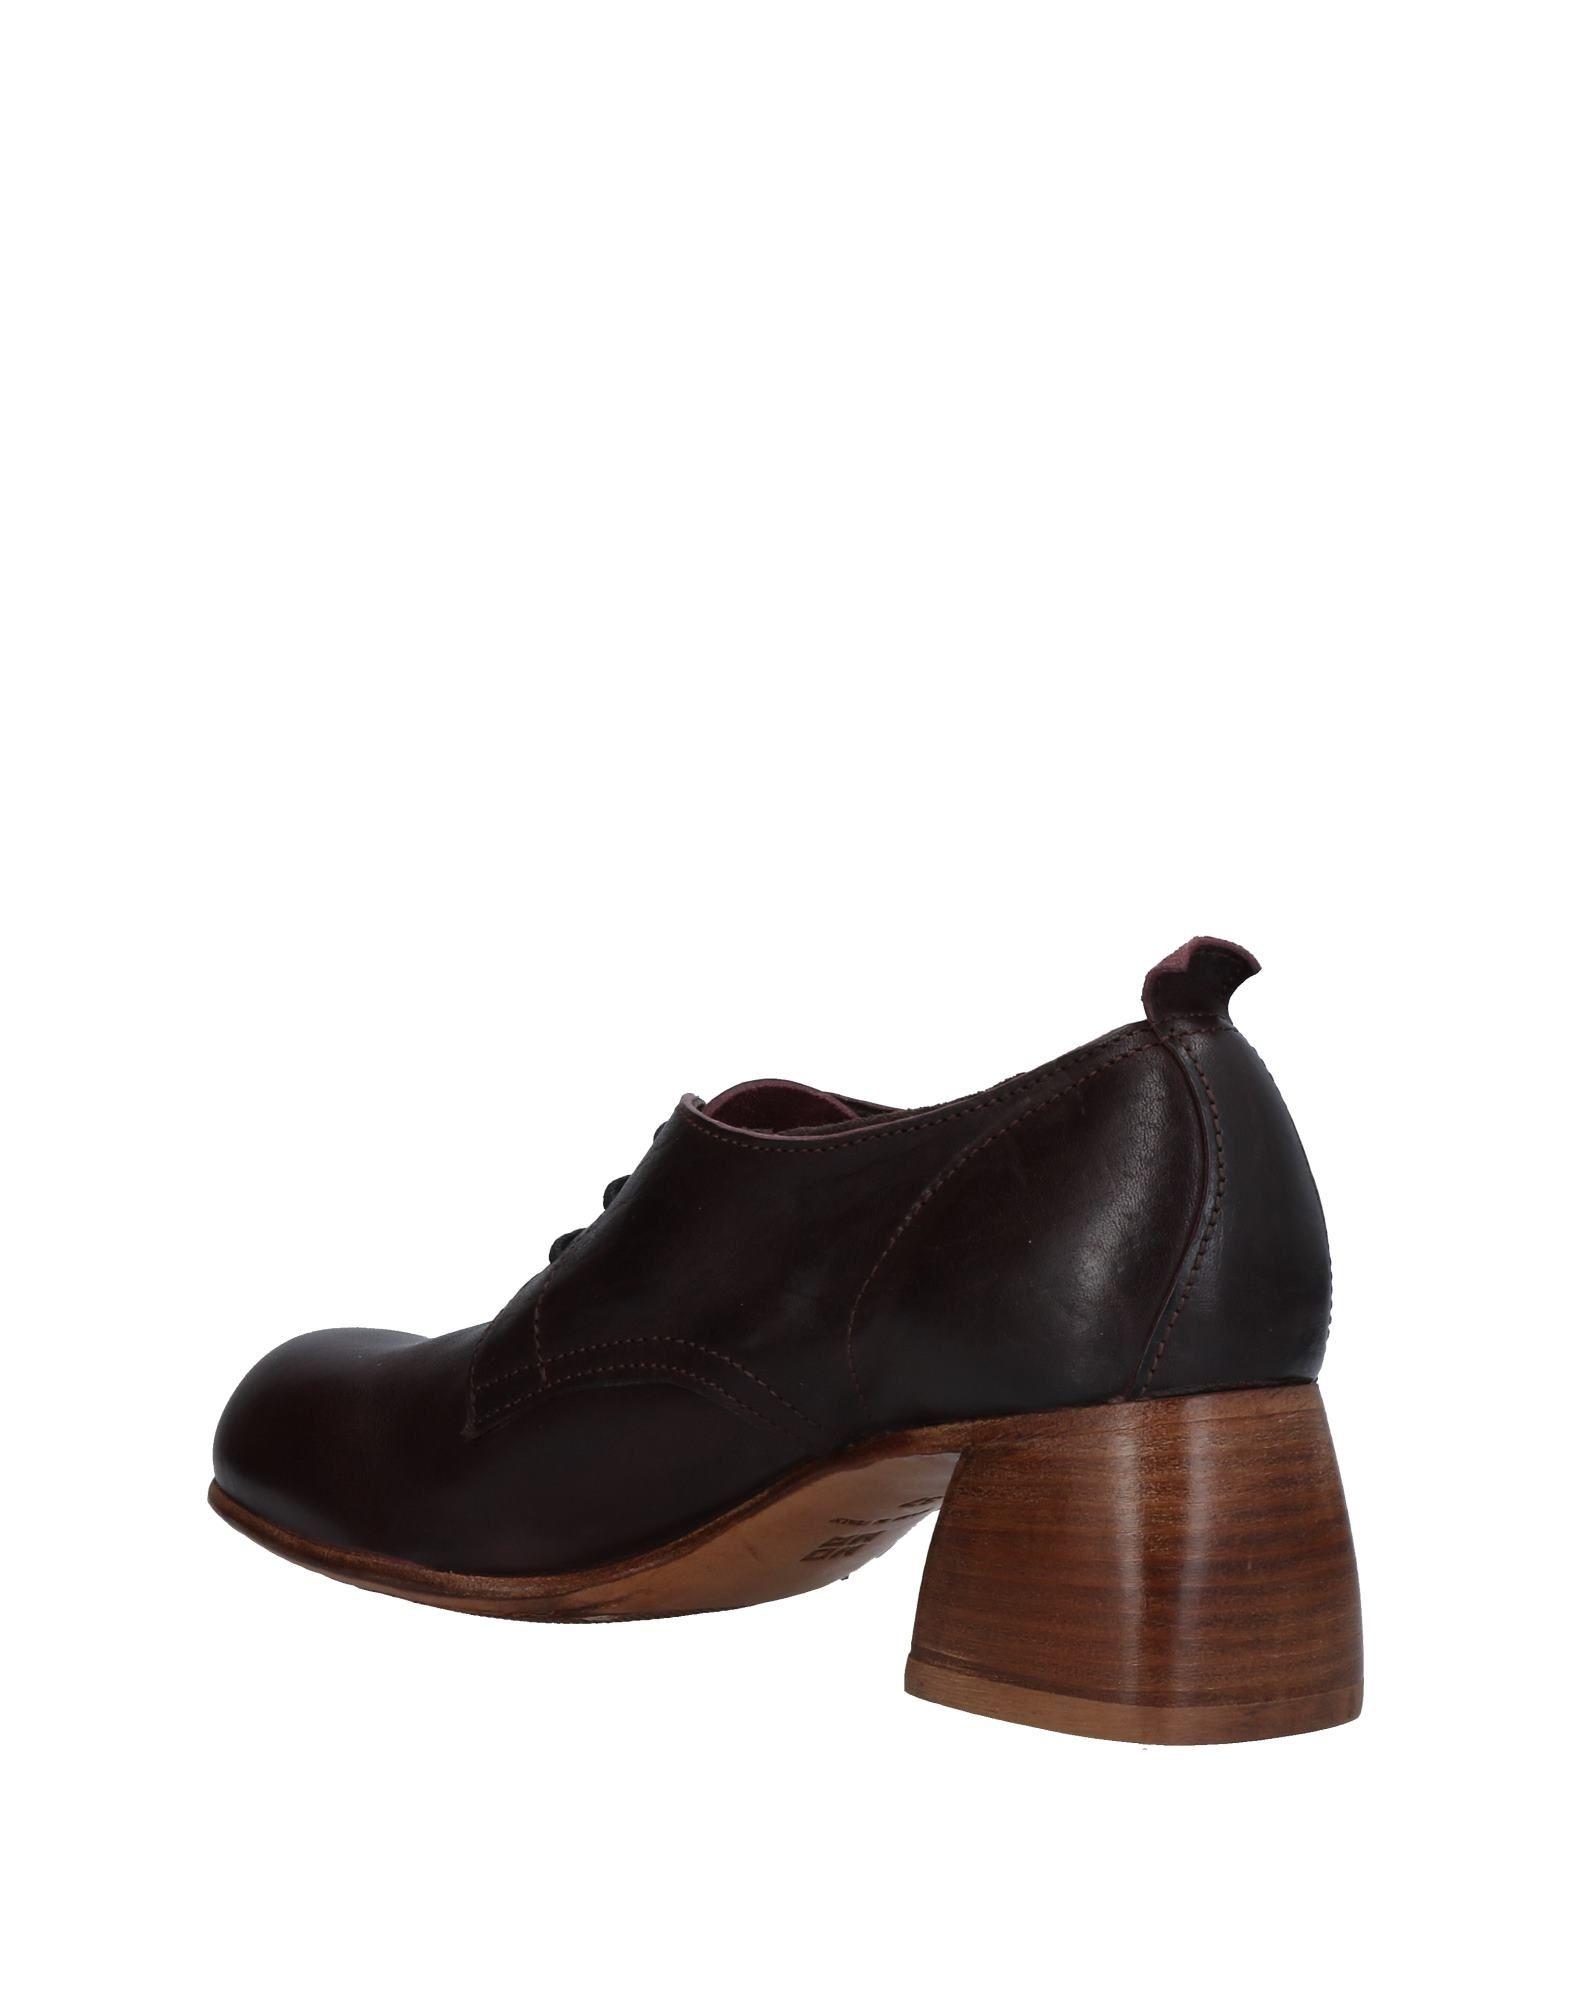 Moma Schnürschuhe Schuhe Damen  11420244PEGut aussehende strapazierfähige Schuhe Schnürschuhe 82f87c